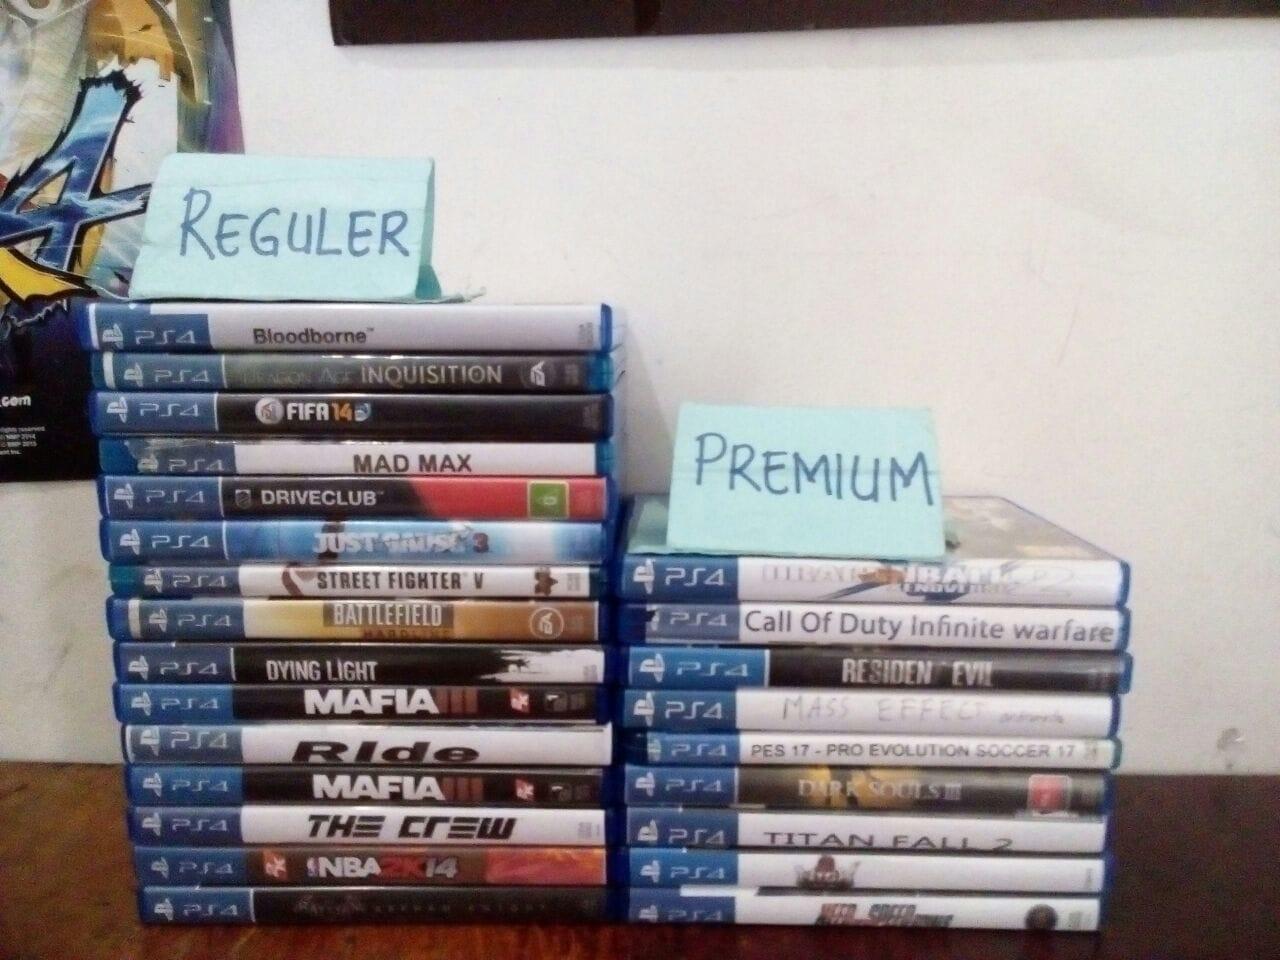 Jual Rental Sewa Bd Kaset Game Ps4 Sepuasnya Toko Smileykids Titanfall 2 Tokopedia